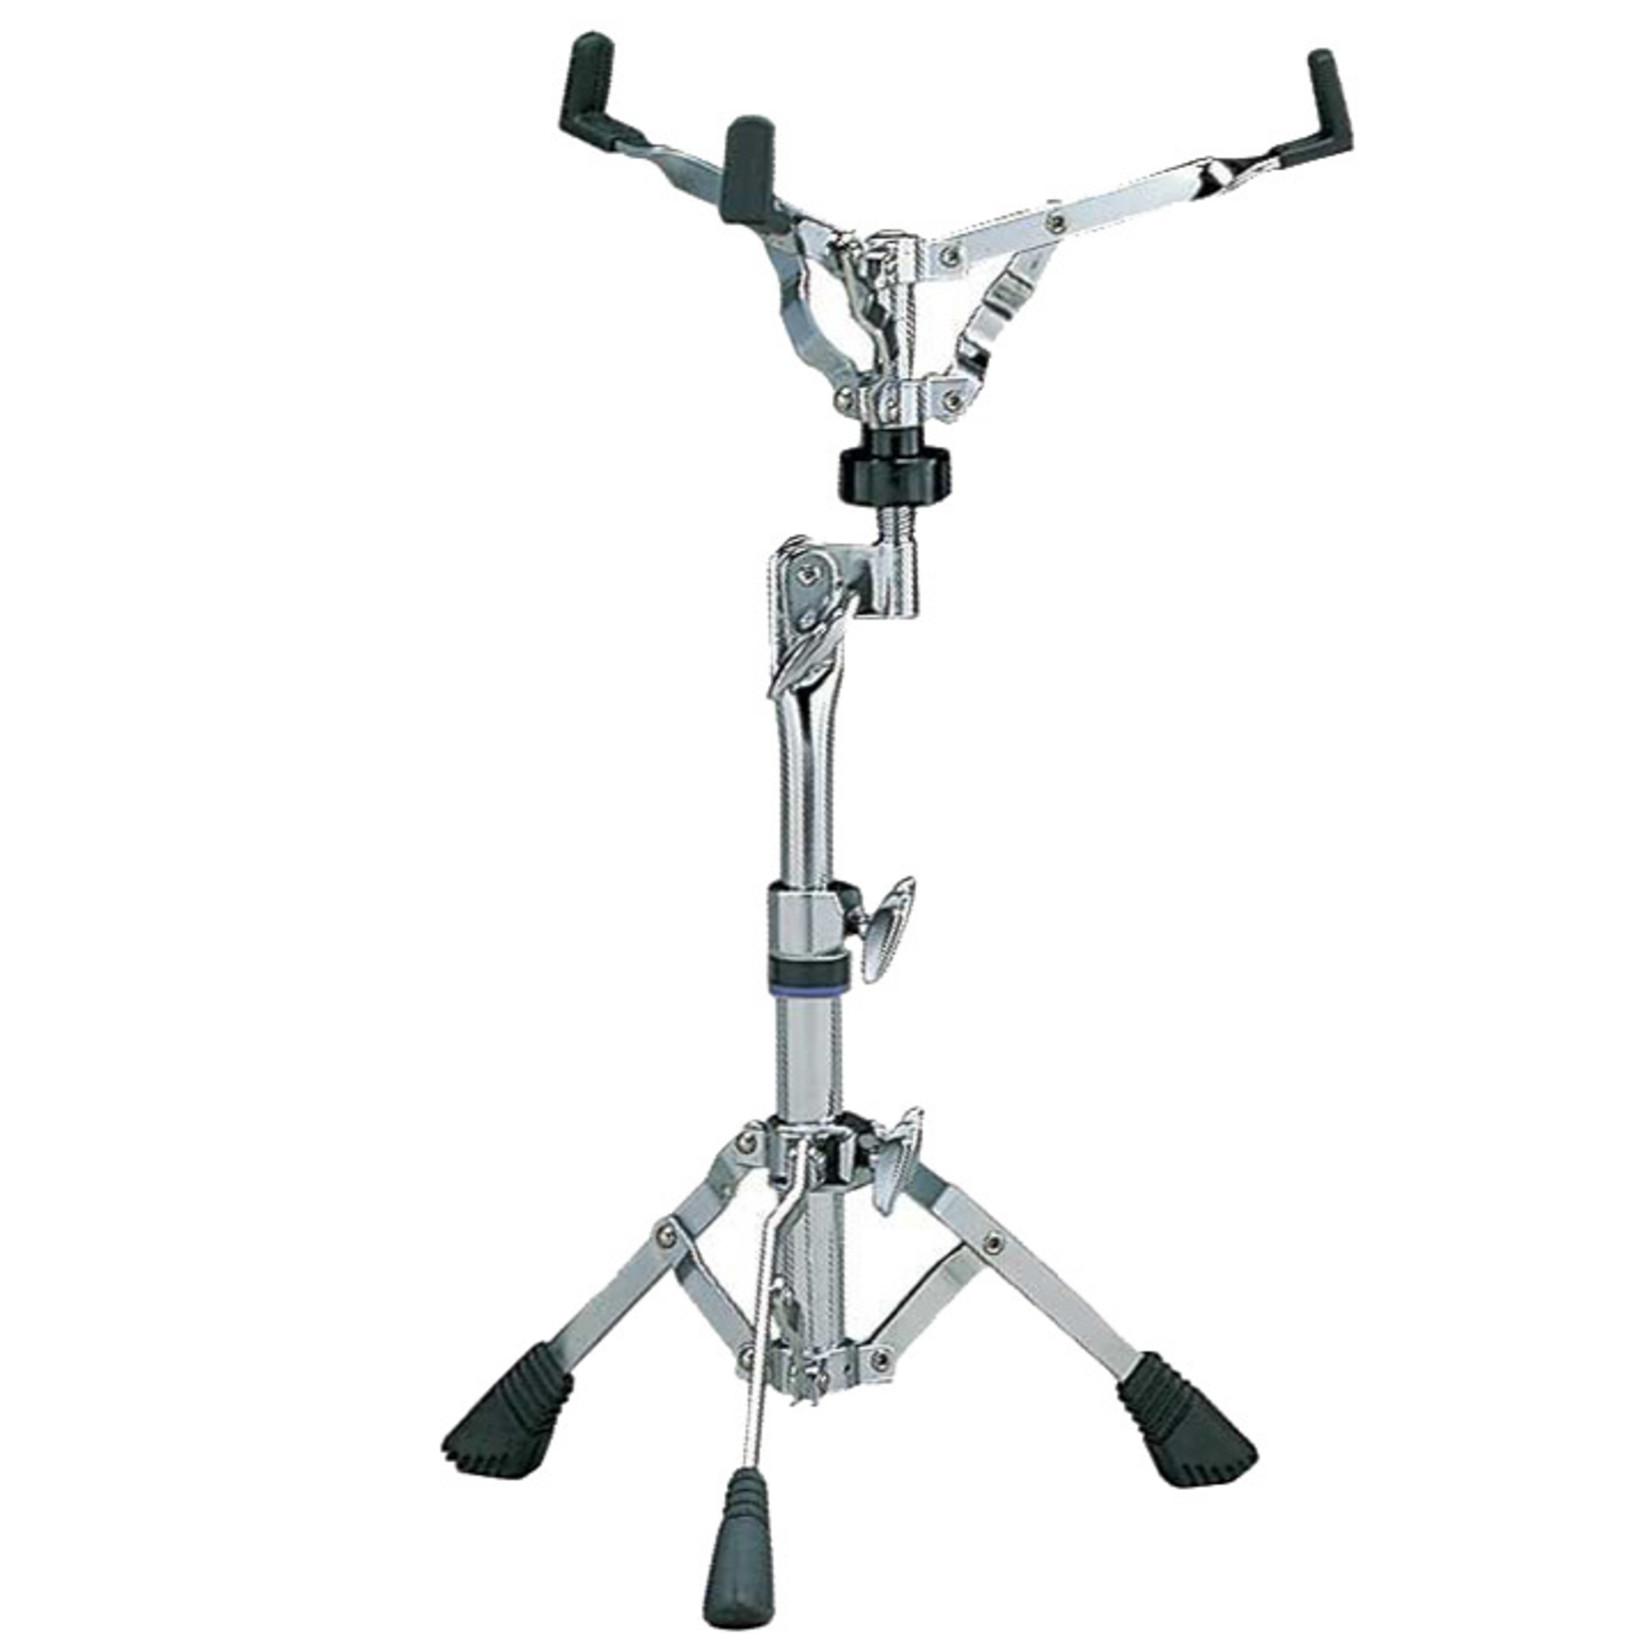 Yamaha Yamaha Snare Drum Stand - Medium Weight - Single Braced